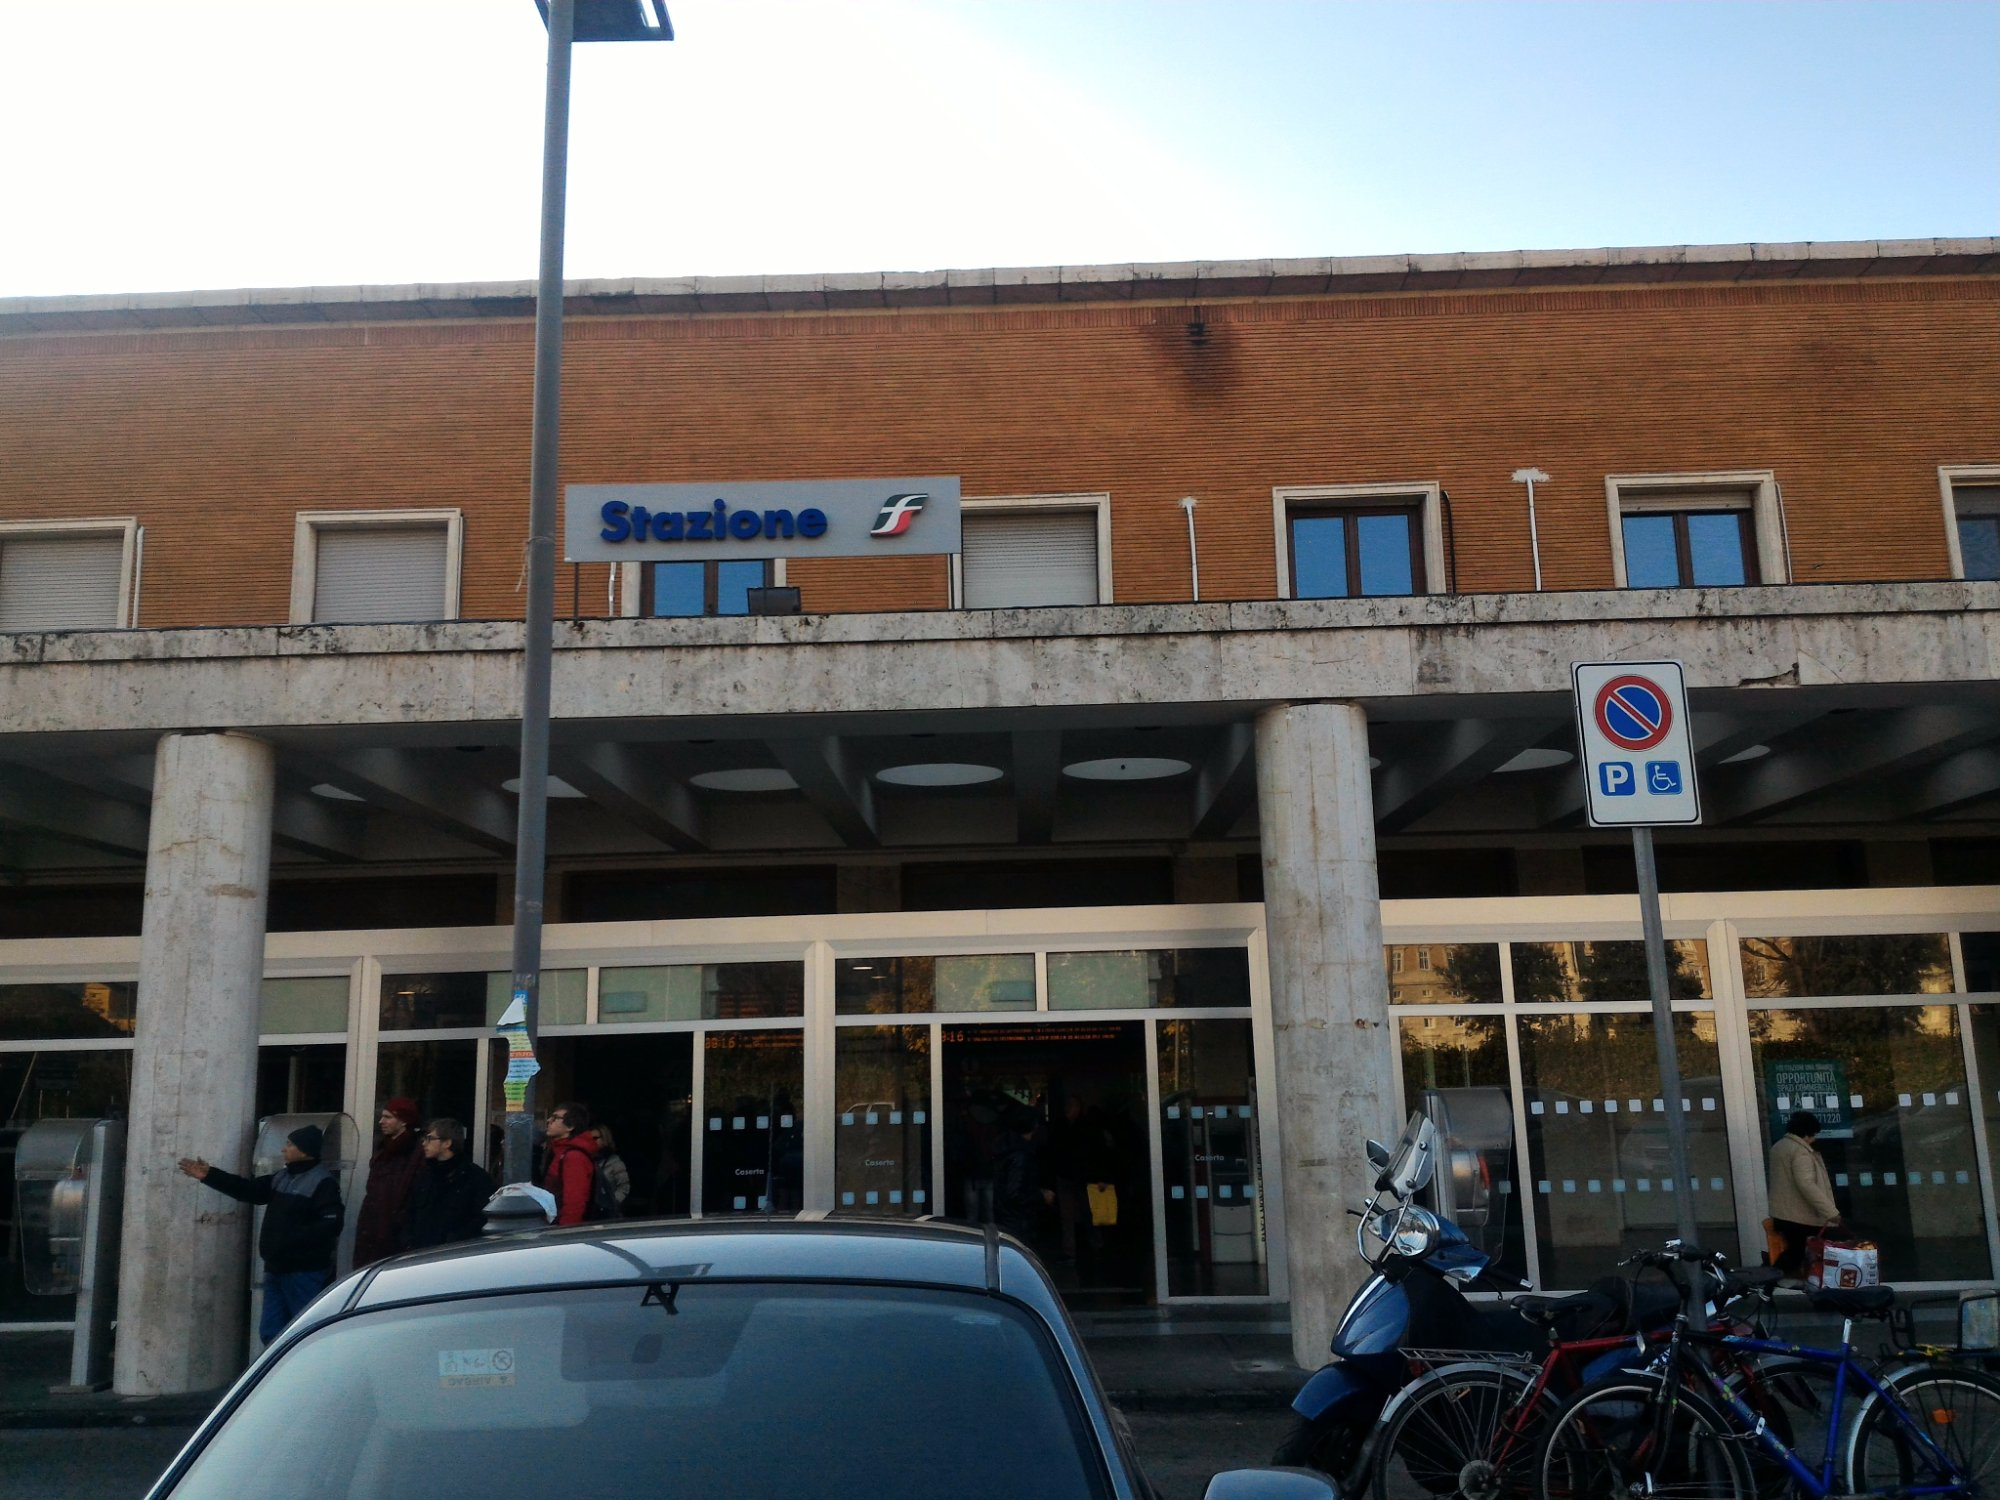 Stazione Ferroviaria di Caserta